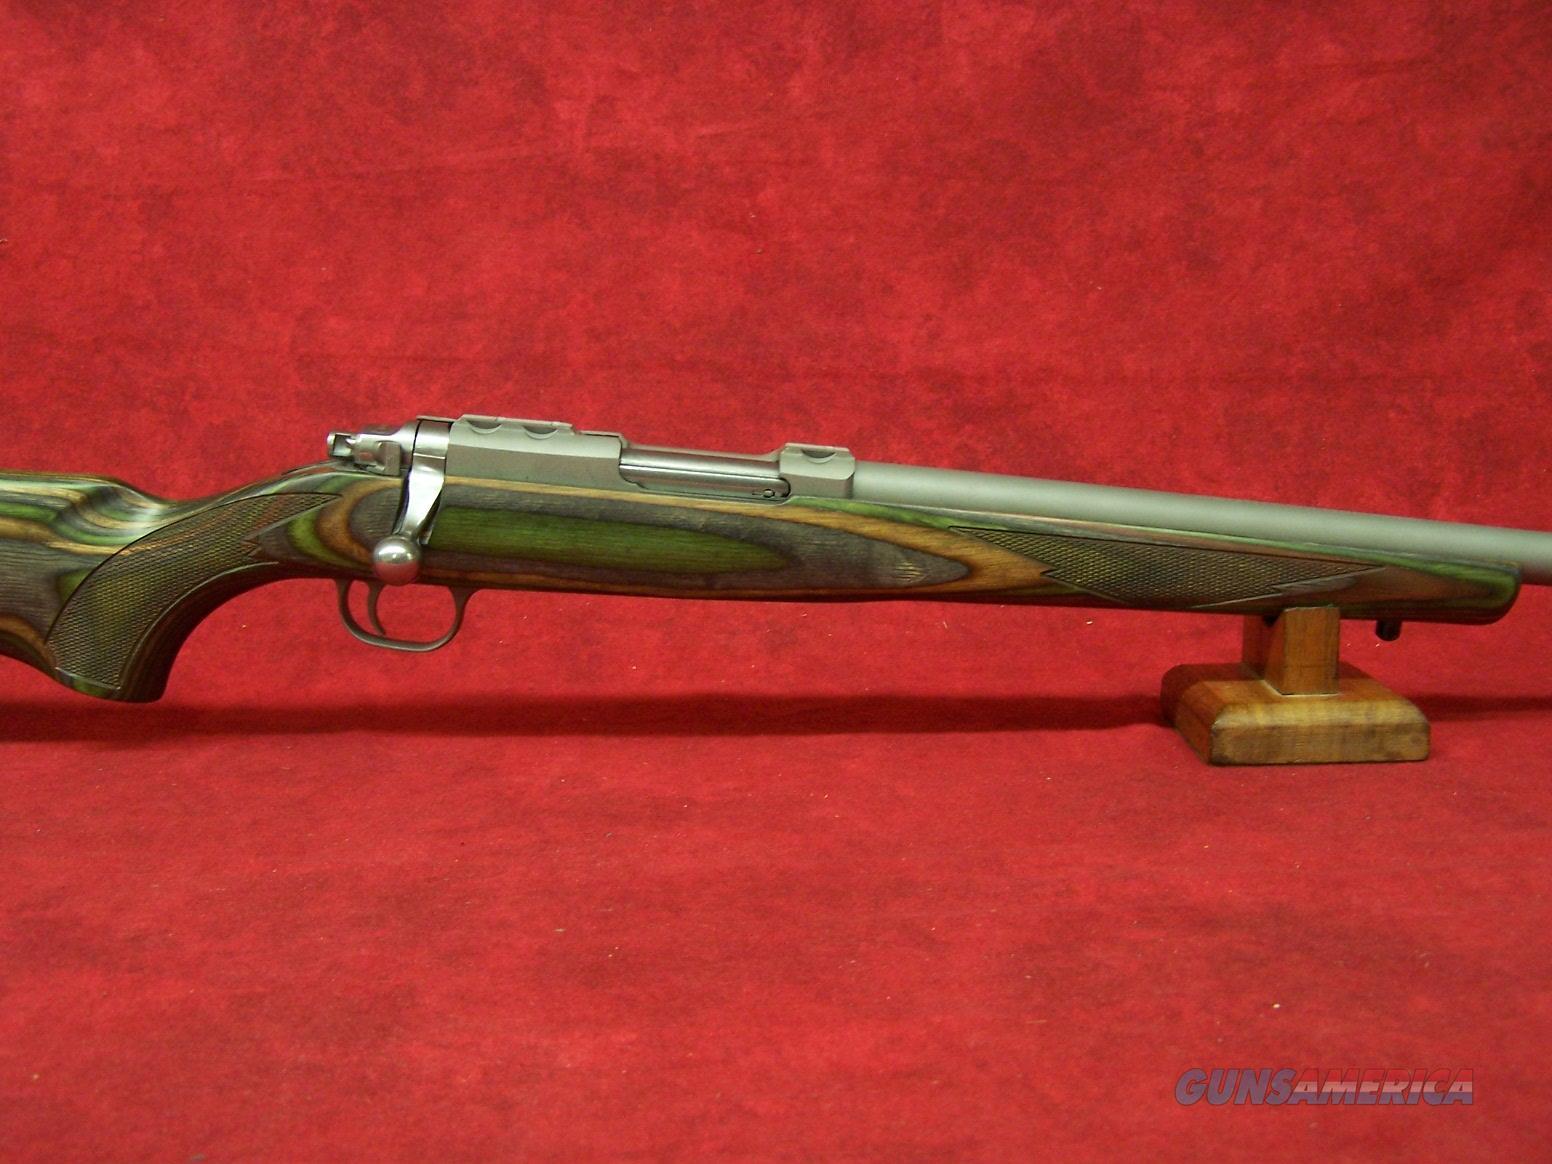 "Ruger 77/17 .17 Hornet 24"" Stainless Steel Barrel Matte Finish No Sights Green Mountain Laminate (07212)  Guns > Rifles > Ruger Rifles > Model 77"